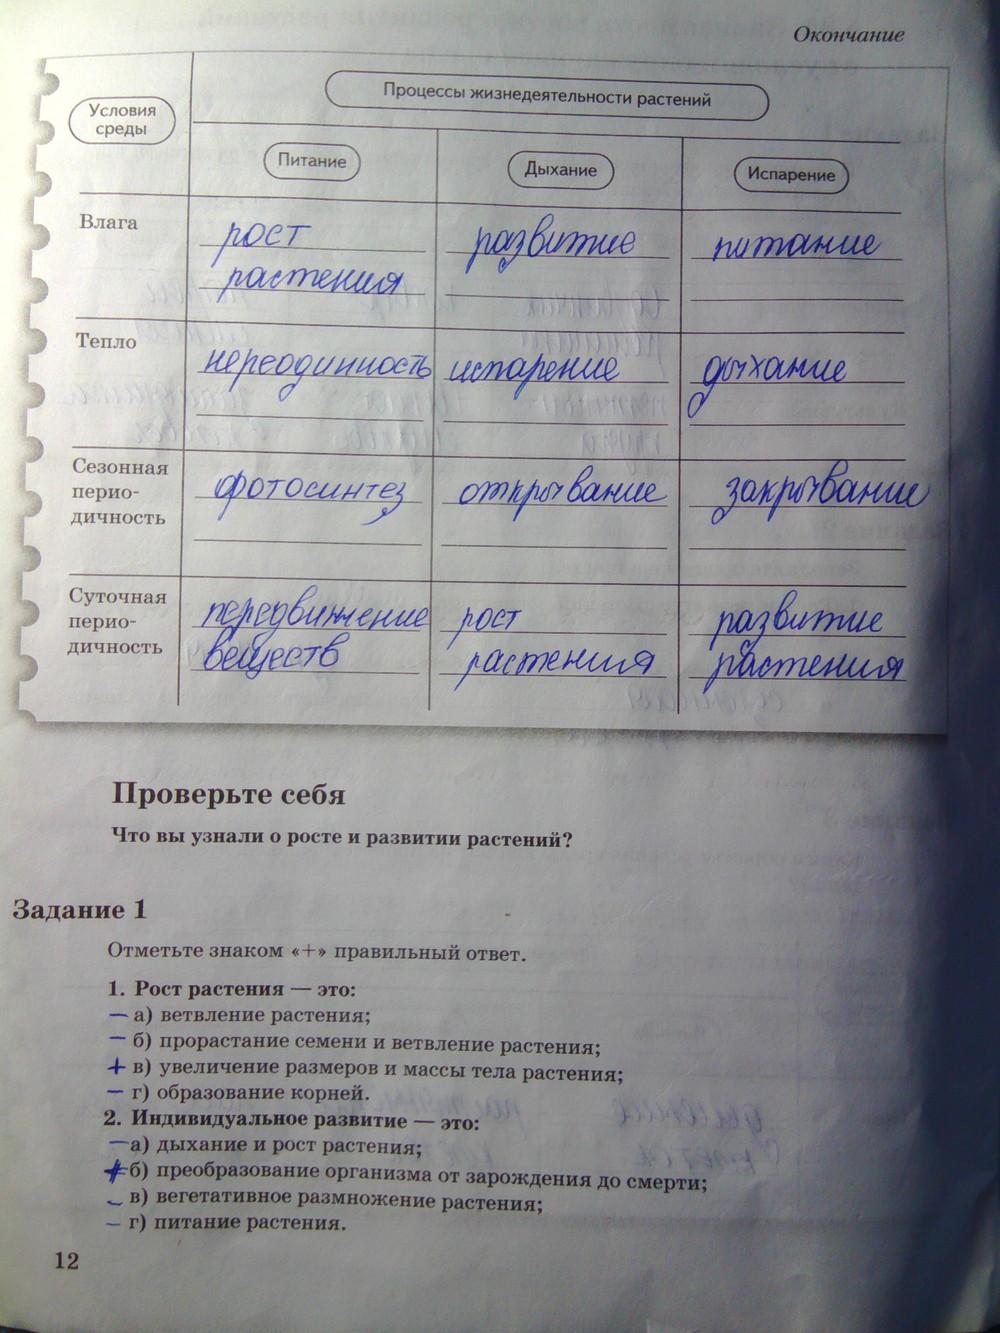 Решебник По Биологии Корнилова 2018